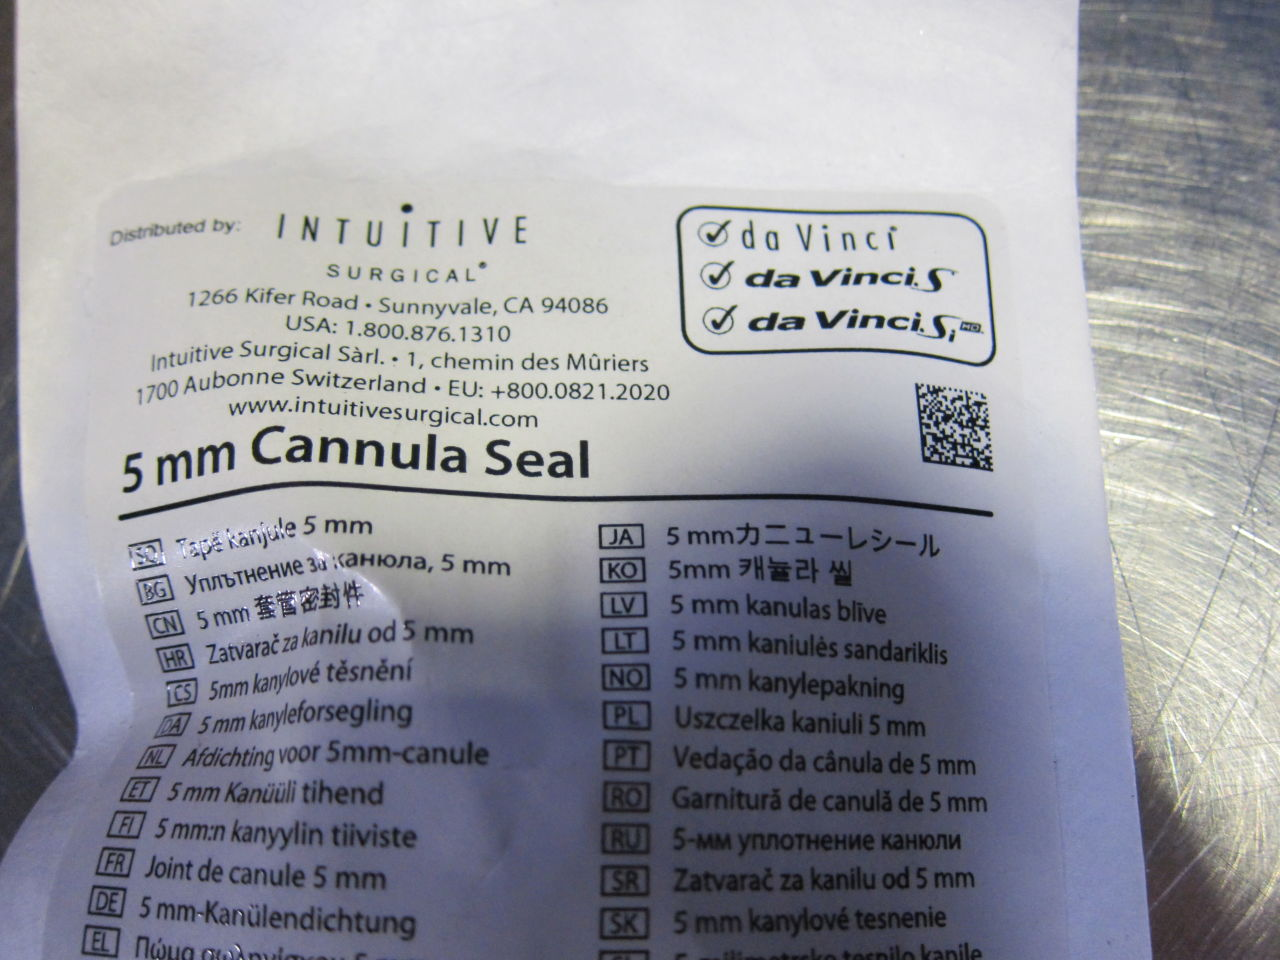 INTUITIVE SURGICAL DA VINCI 400161 Cannula Seal - Lot of 31